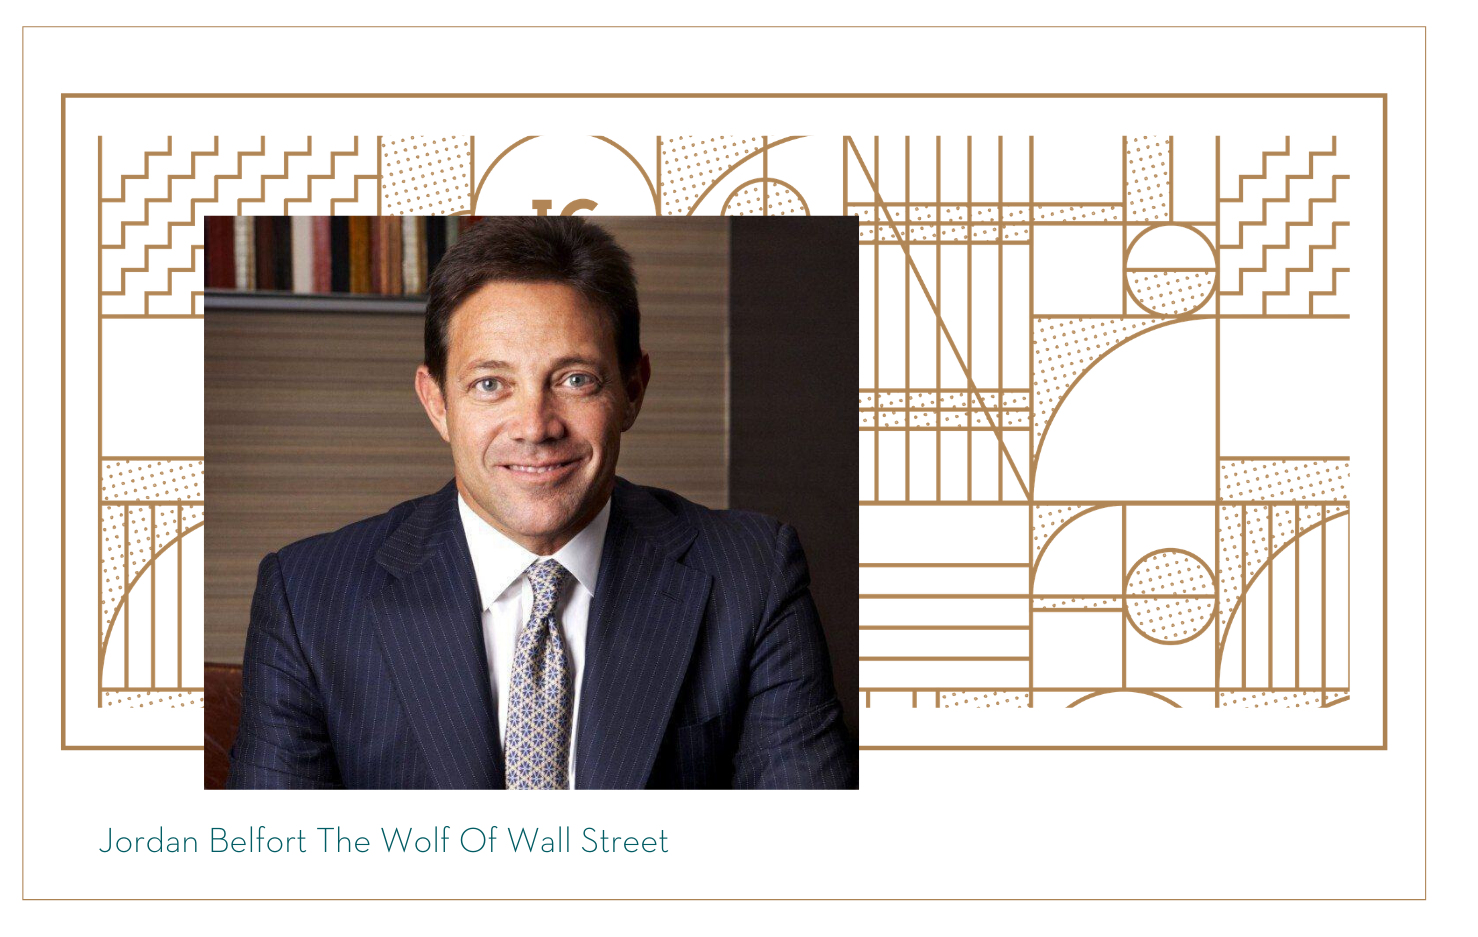 Jordan Belfort The Wolf Of Wall Street